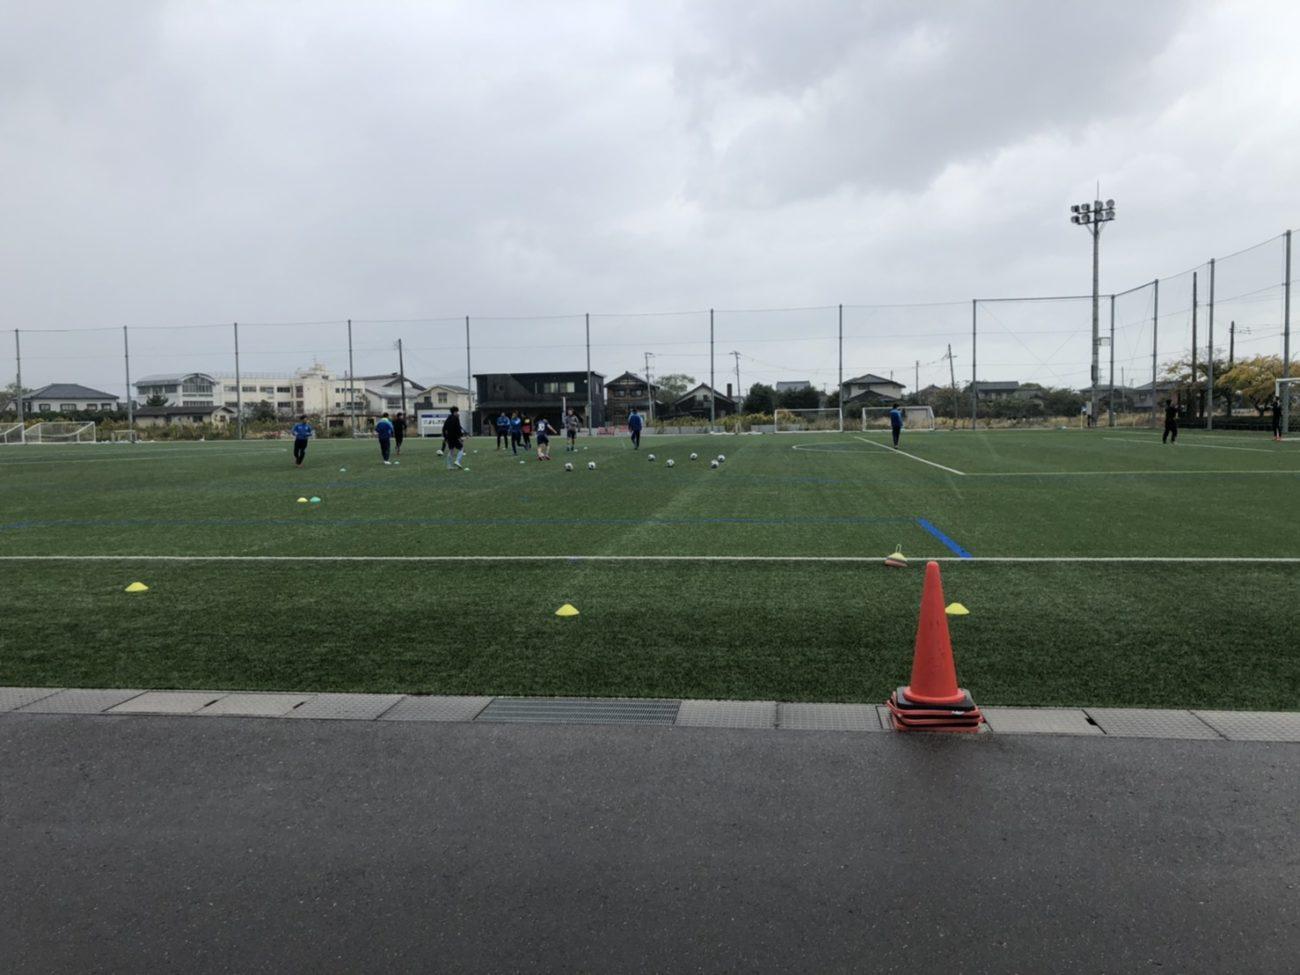 FCアビエス-第43回北信越チャレンジリーグ2020-第5節-西蒲区サルビアサッカー場(新潟県)